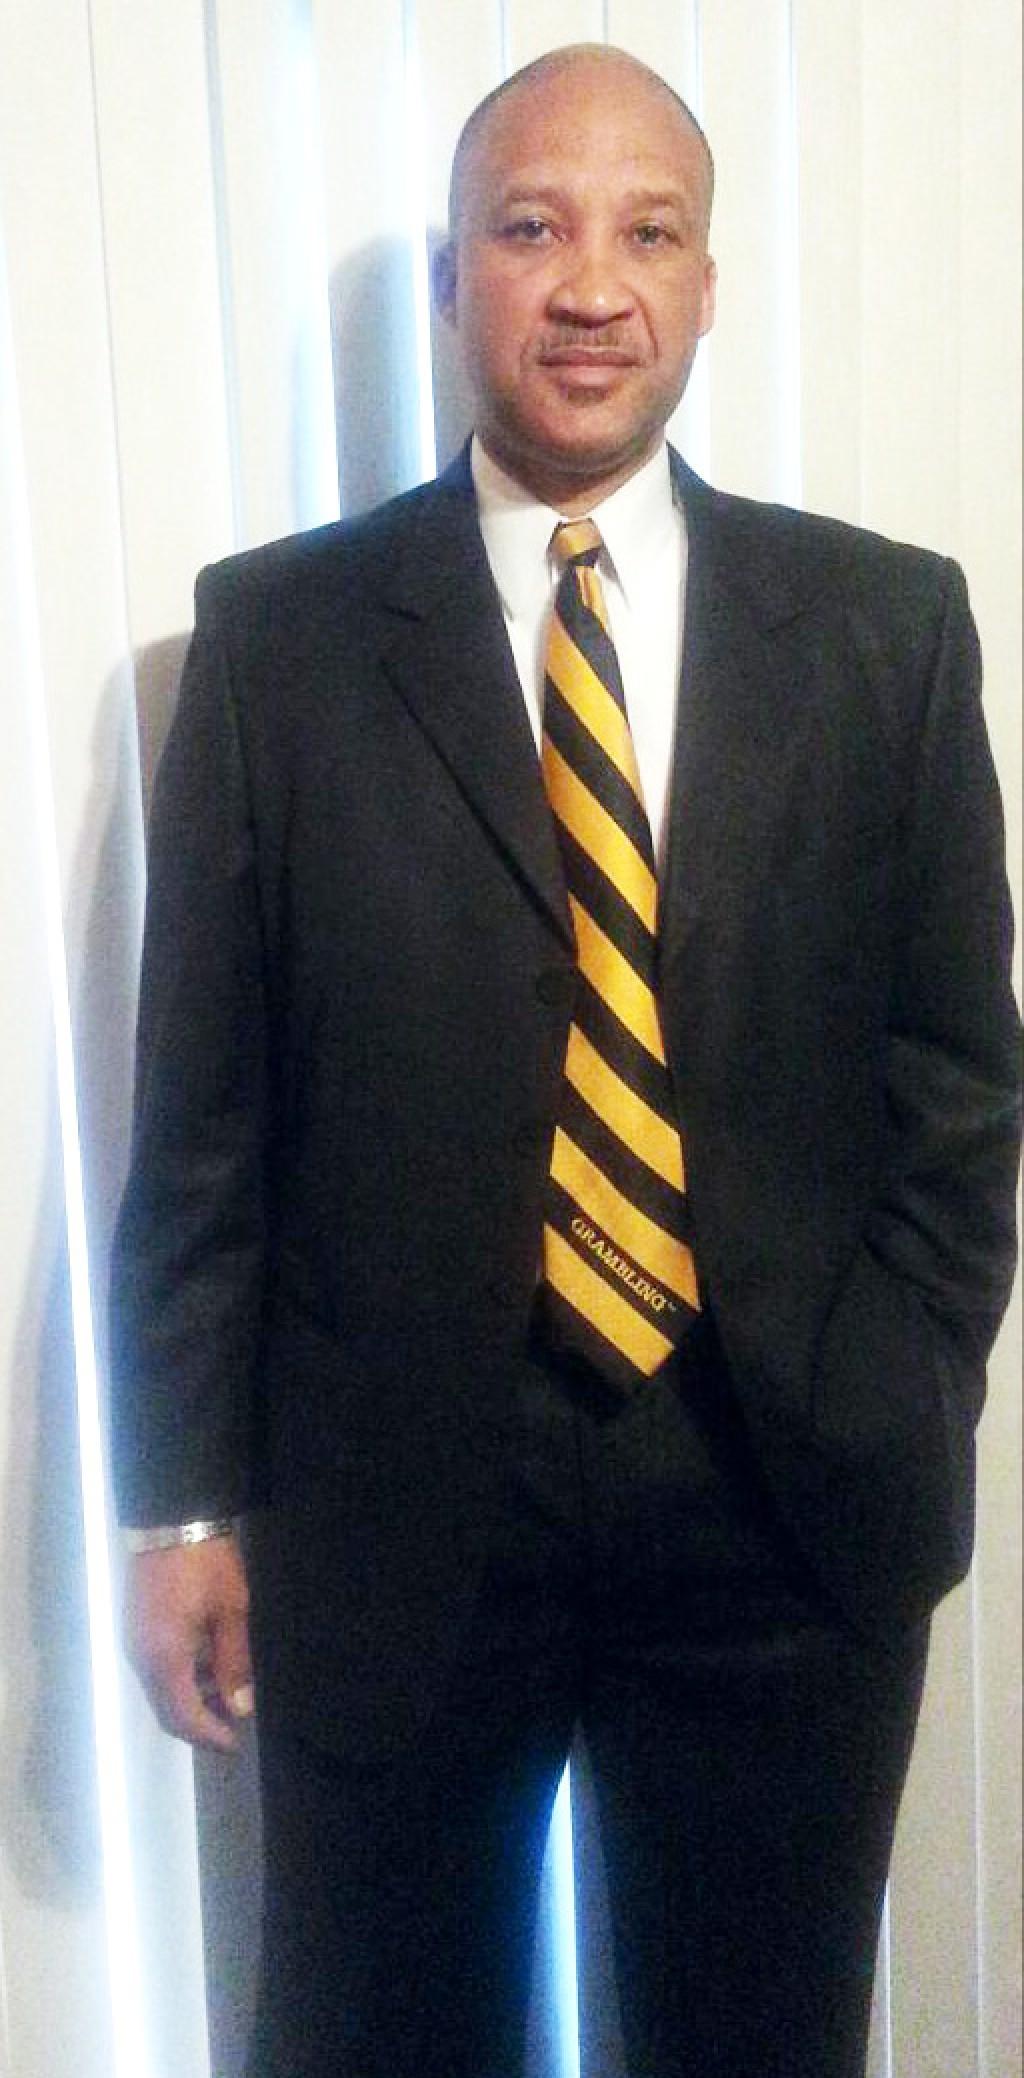 Rev. Larry Holston